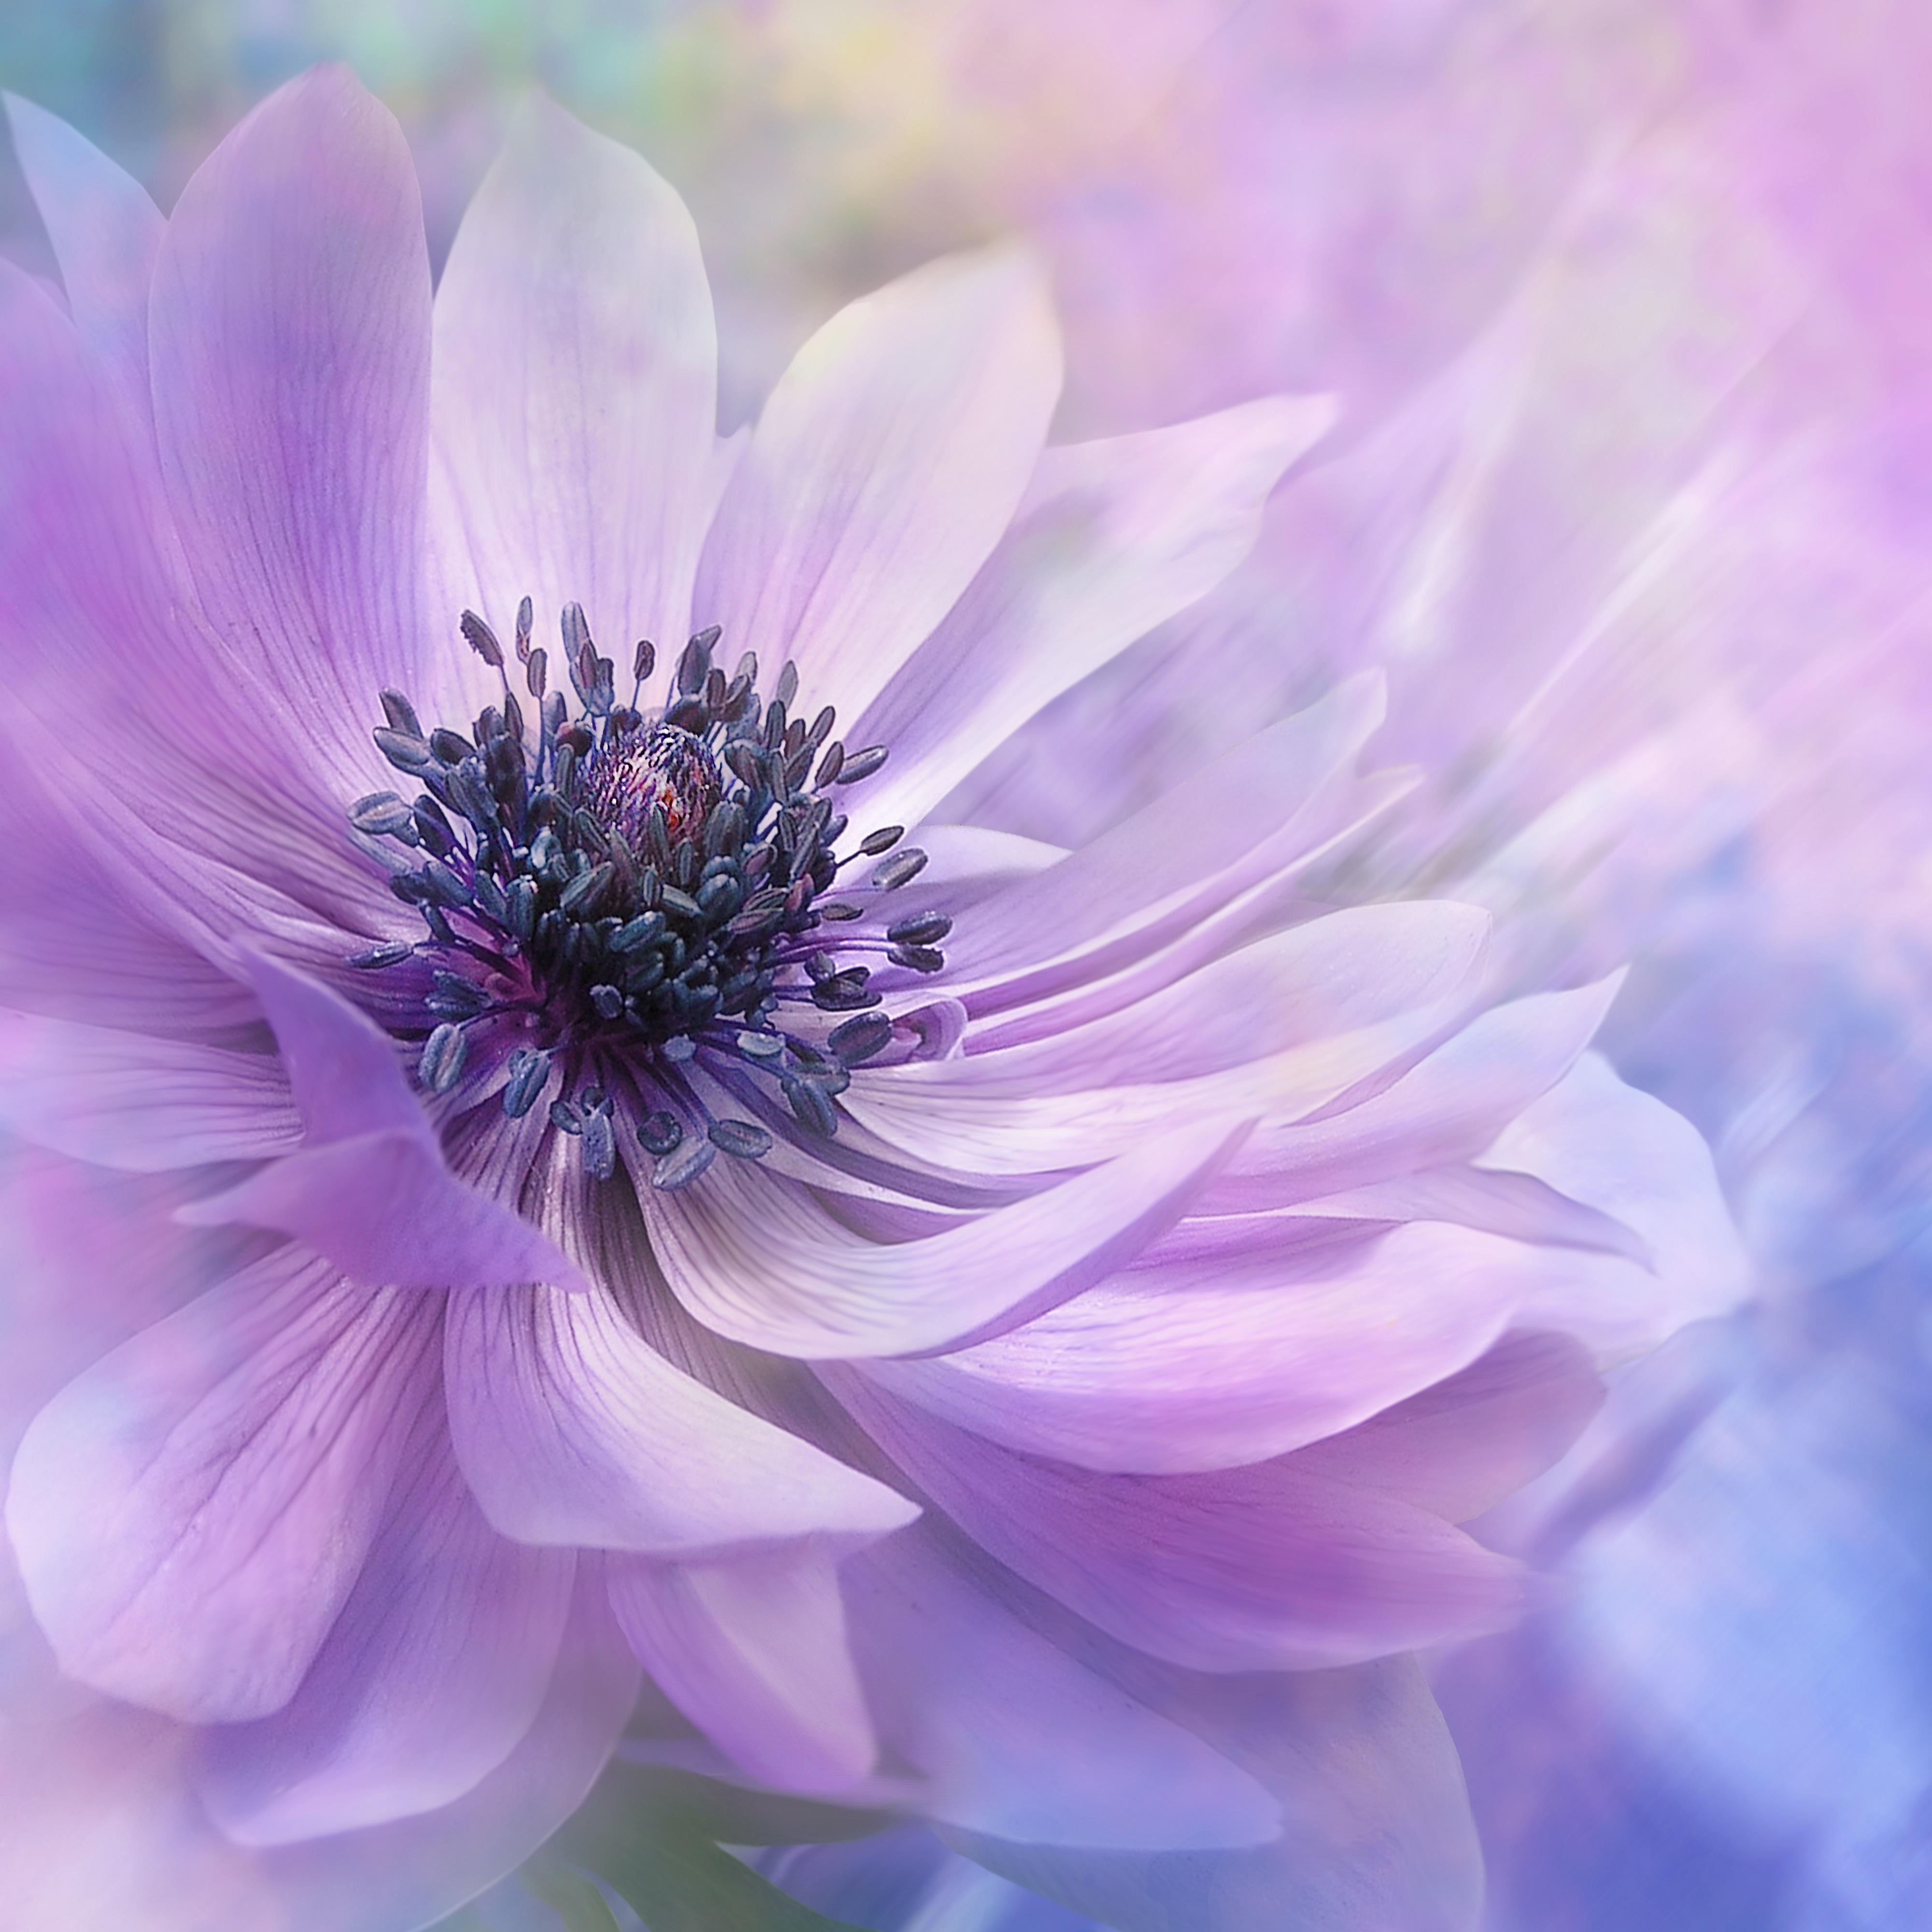 Purple nature landscape flower blossom